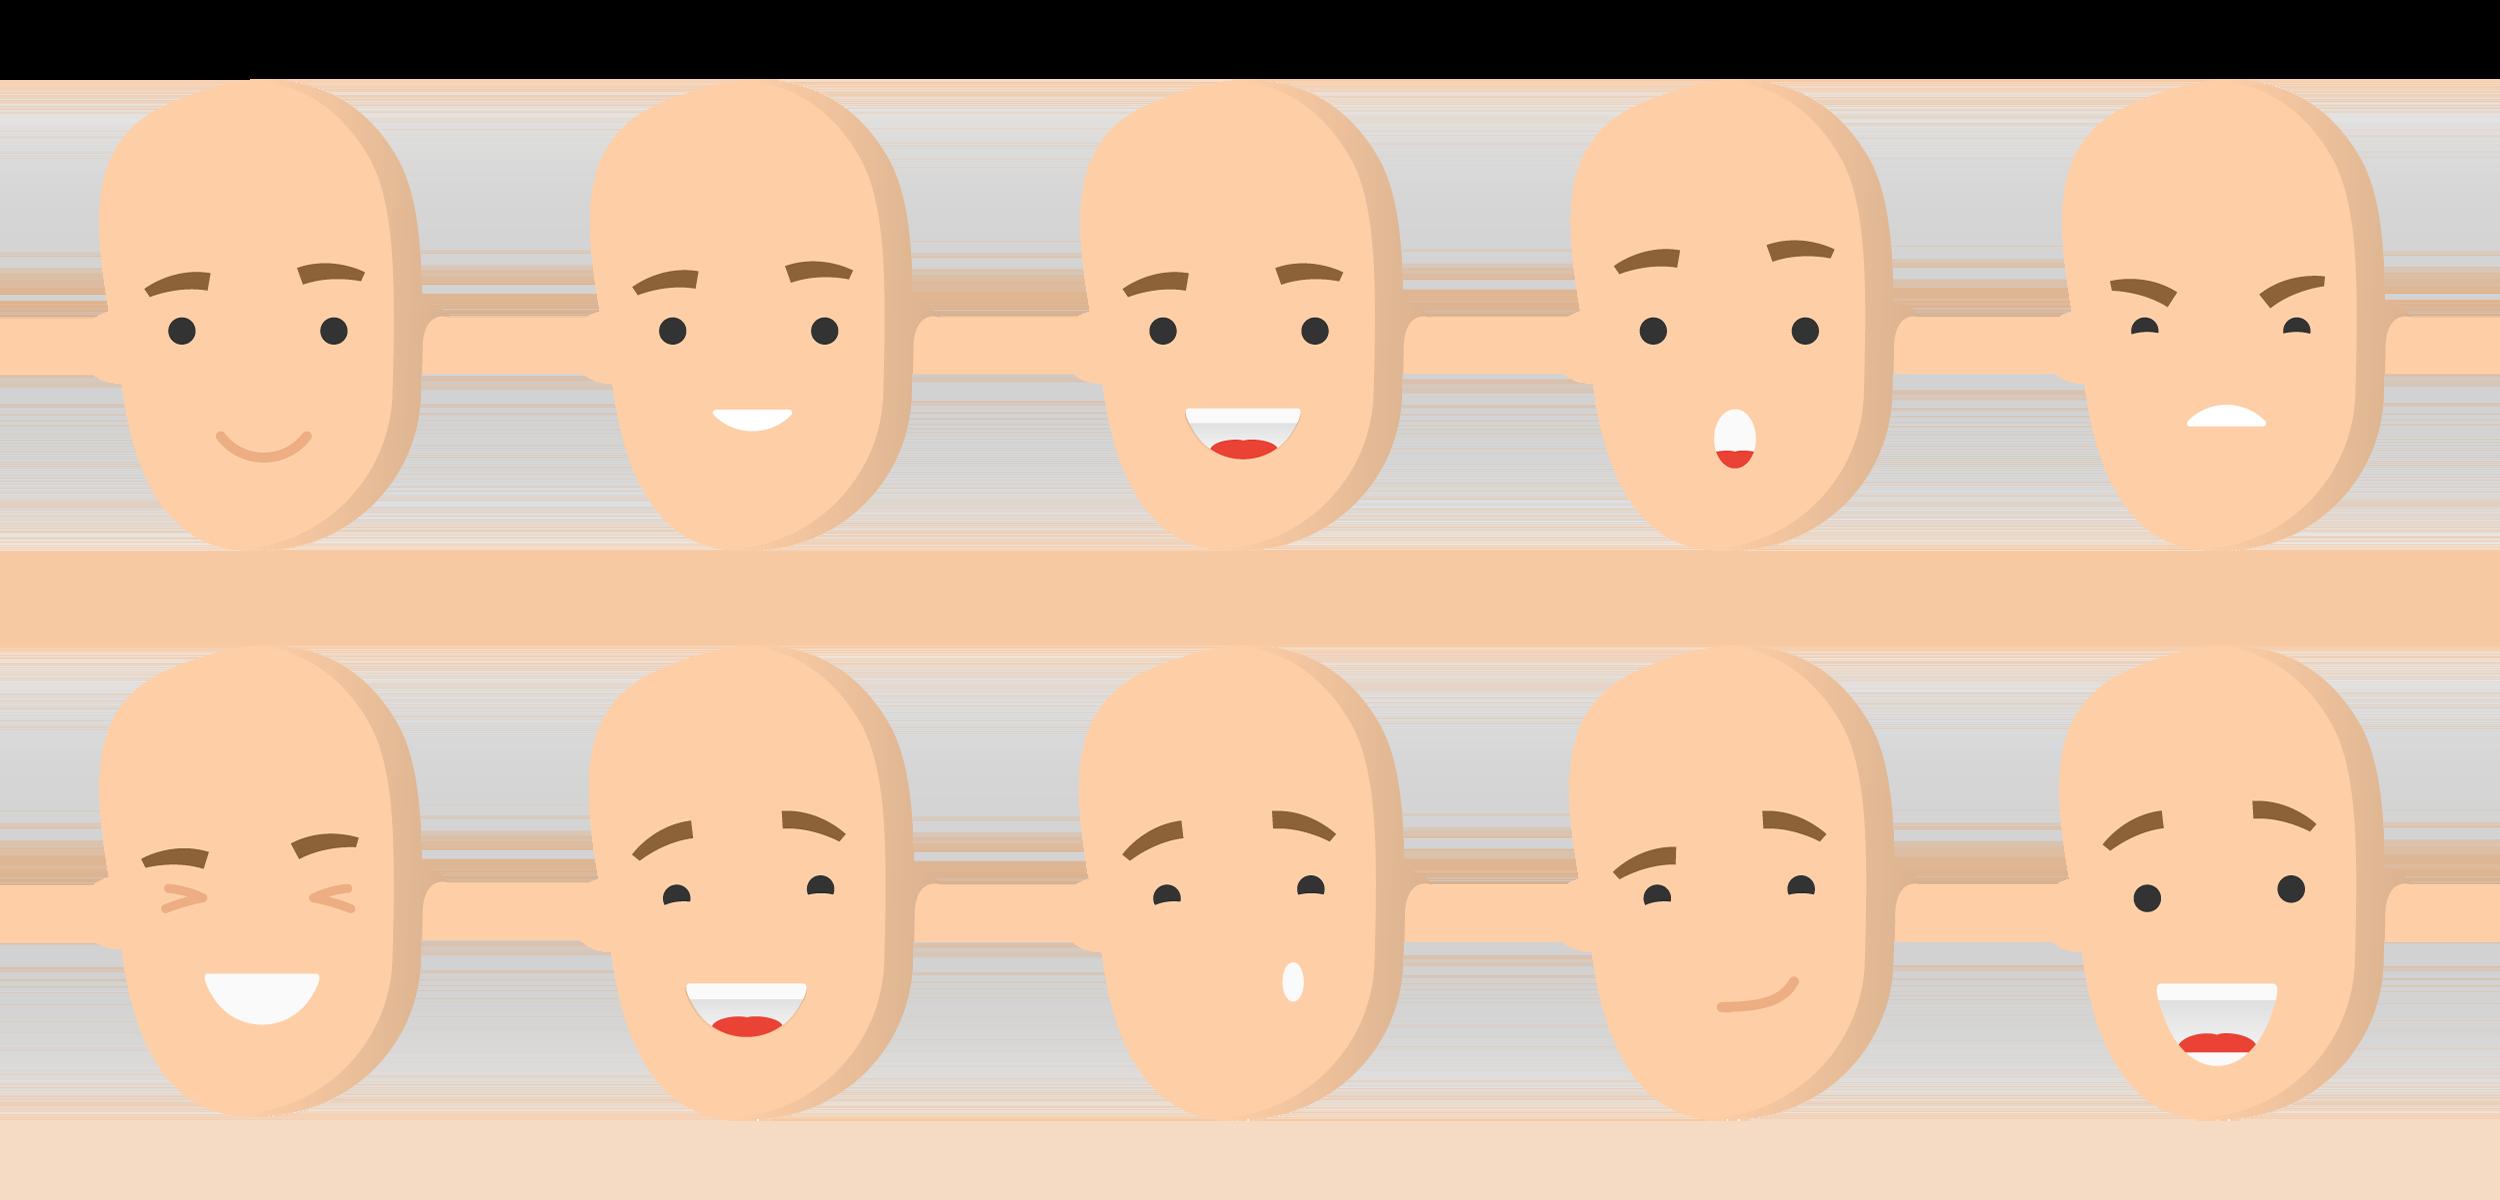 VS_Google_SMB_Face-Expressions